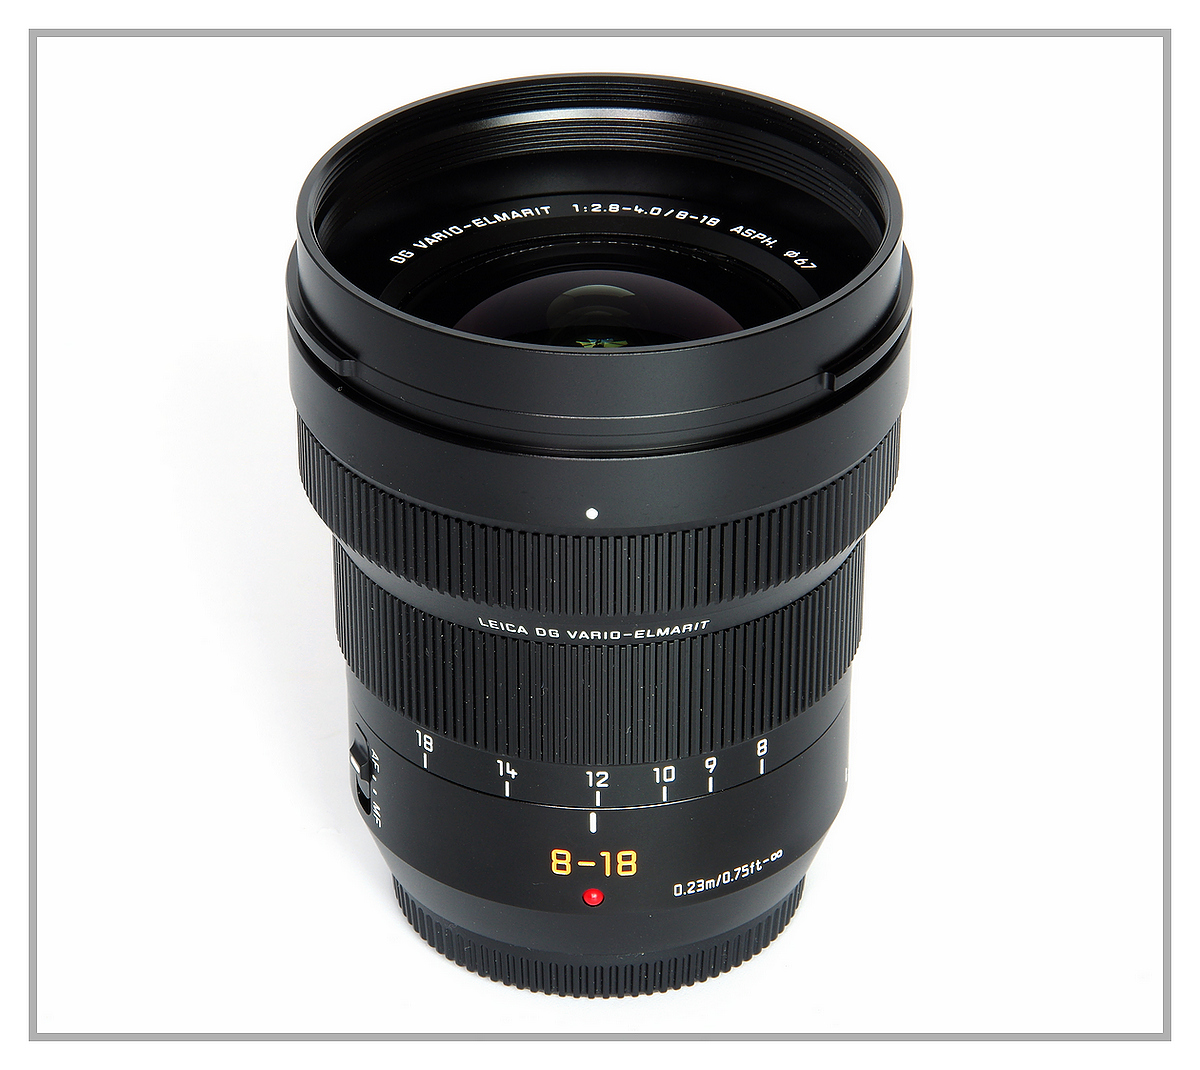 Panasonic 8-18 f2.8-4.0